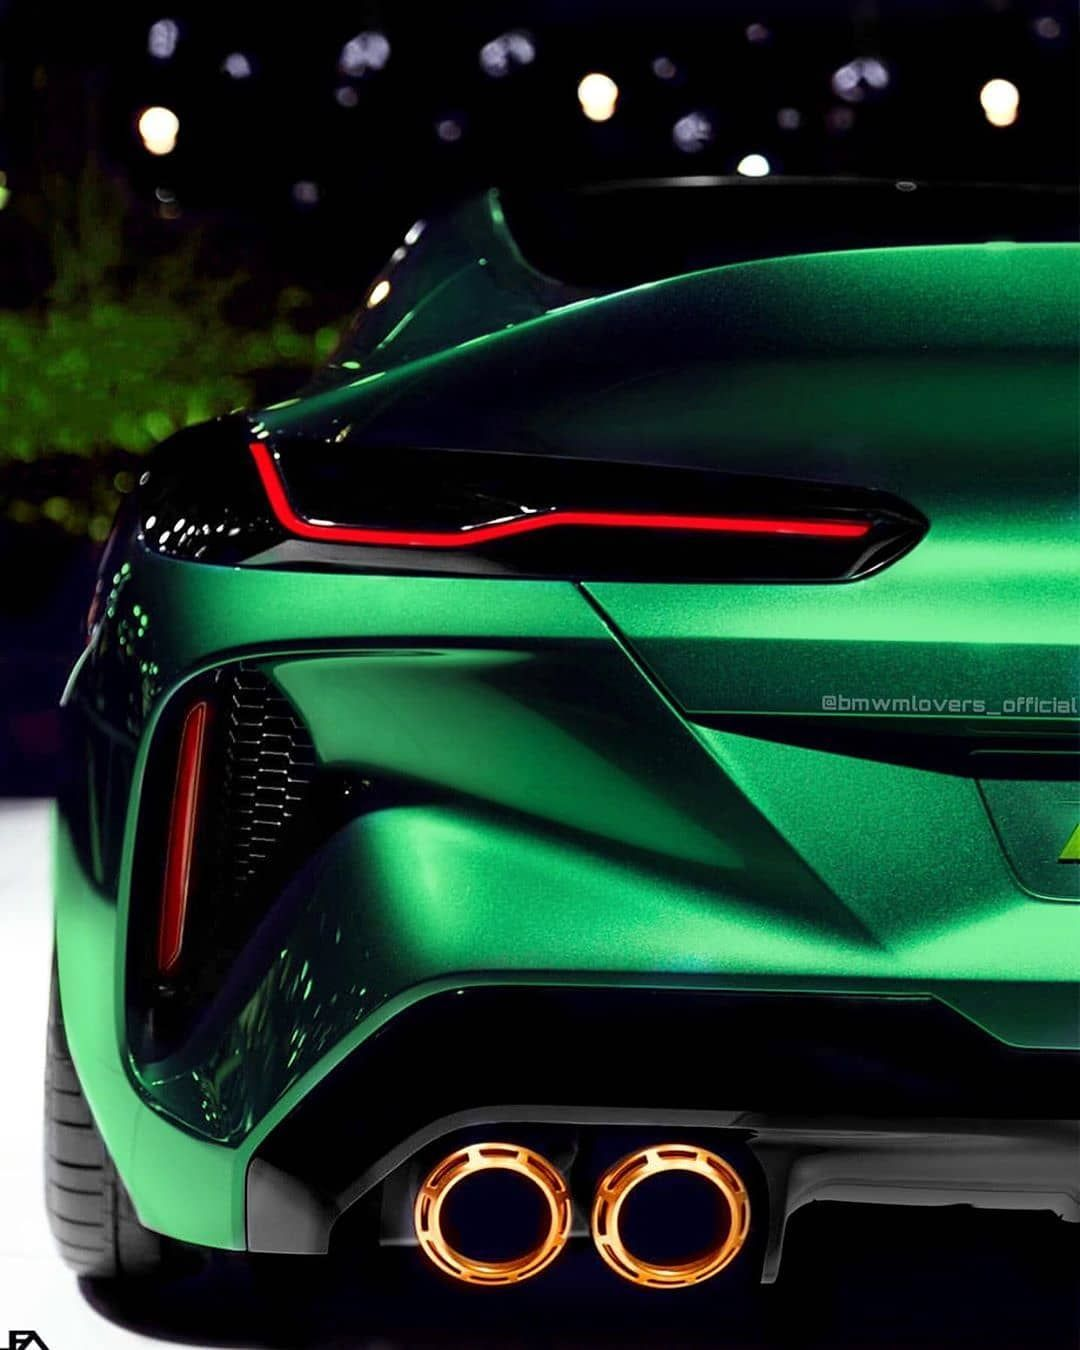 Bmw Mpoweer Bmw Mpower Serie M Auto Sport Voiture Voiture De Luxe En 2020 Fond D Ecran Bmw Bmw Bmw Classique